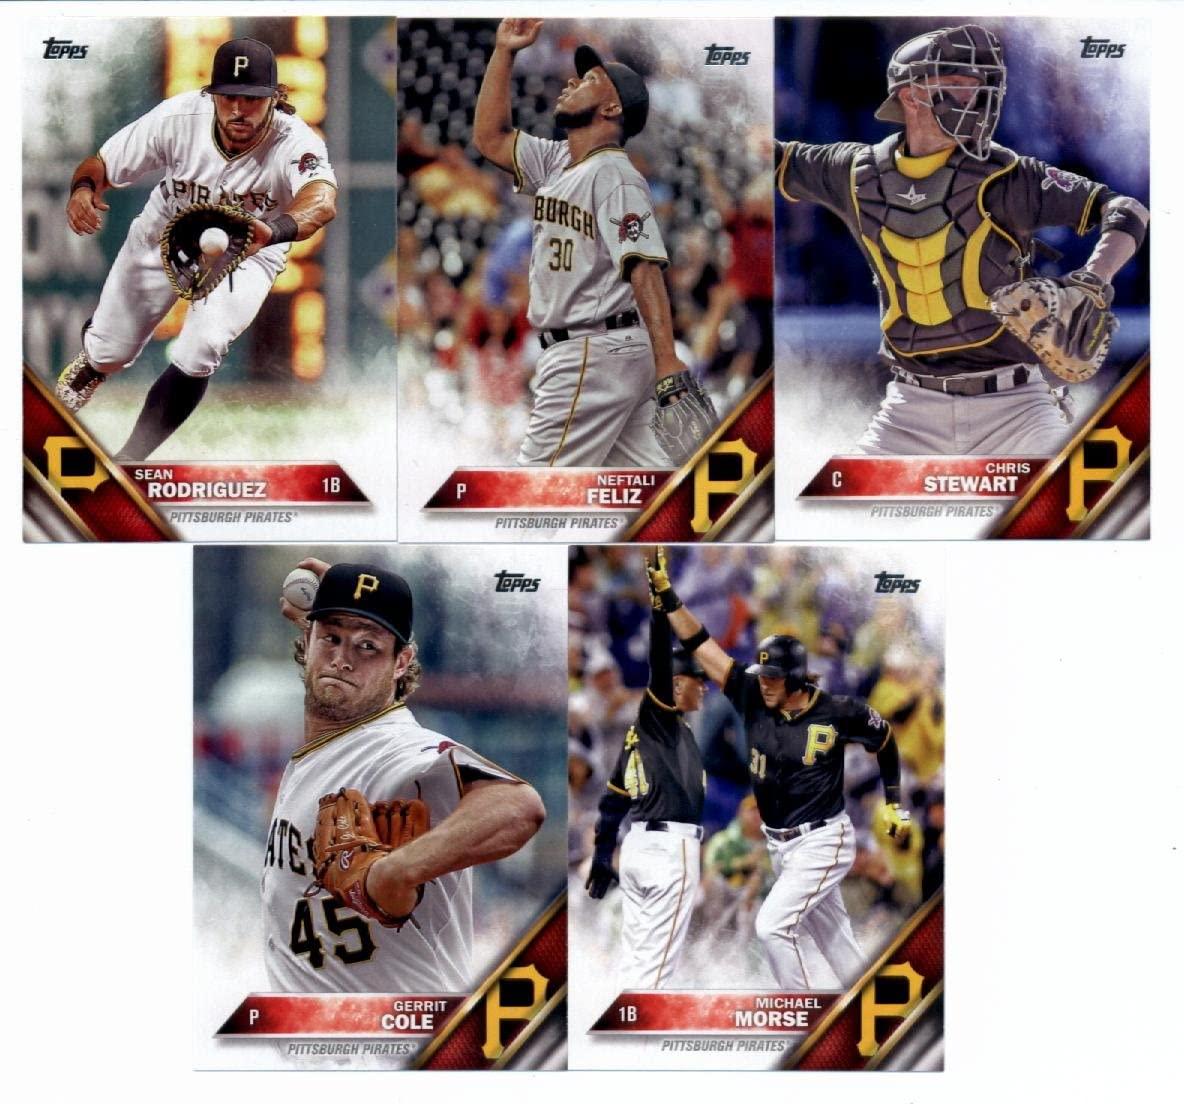 2016 Topps Series 2 Baseball Pittsburgh Pirates Team Set of 11 Cards: Jeff Locke(#361), Michael Morse(#384), Gregory Polanco(#428), Gerrit Cole(#452), Elias Diaz(#504), Tony Watson(#510), Jordy Mercer(#527), Sean Rodriguez(#558), Chris Stewart(#586), Neftali Feliz(#587), Jared Hughes(#665) in Protective Snap Case